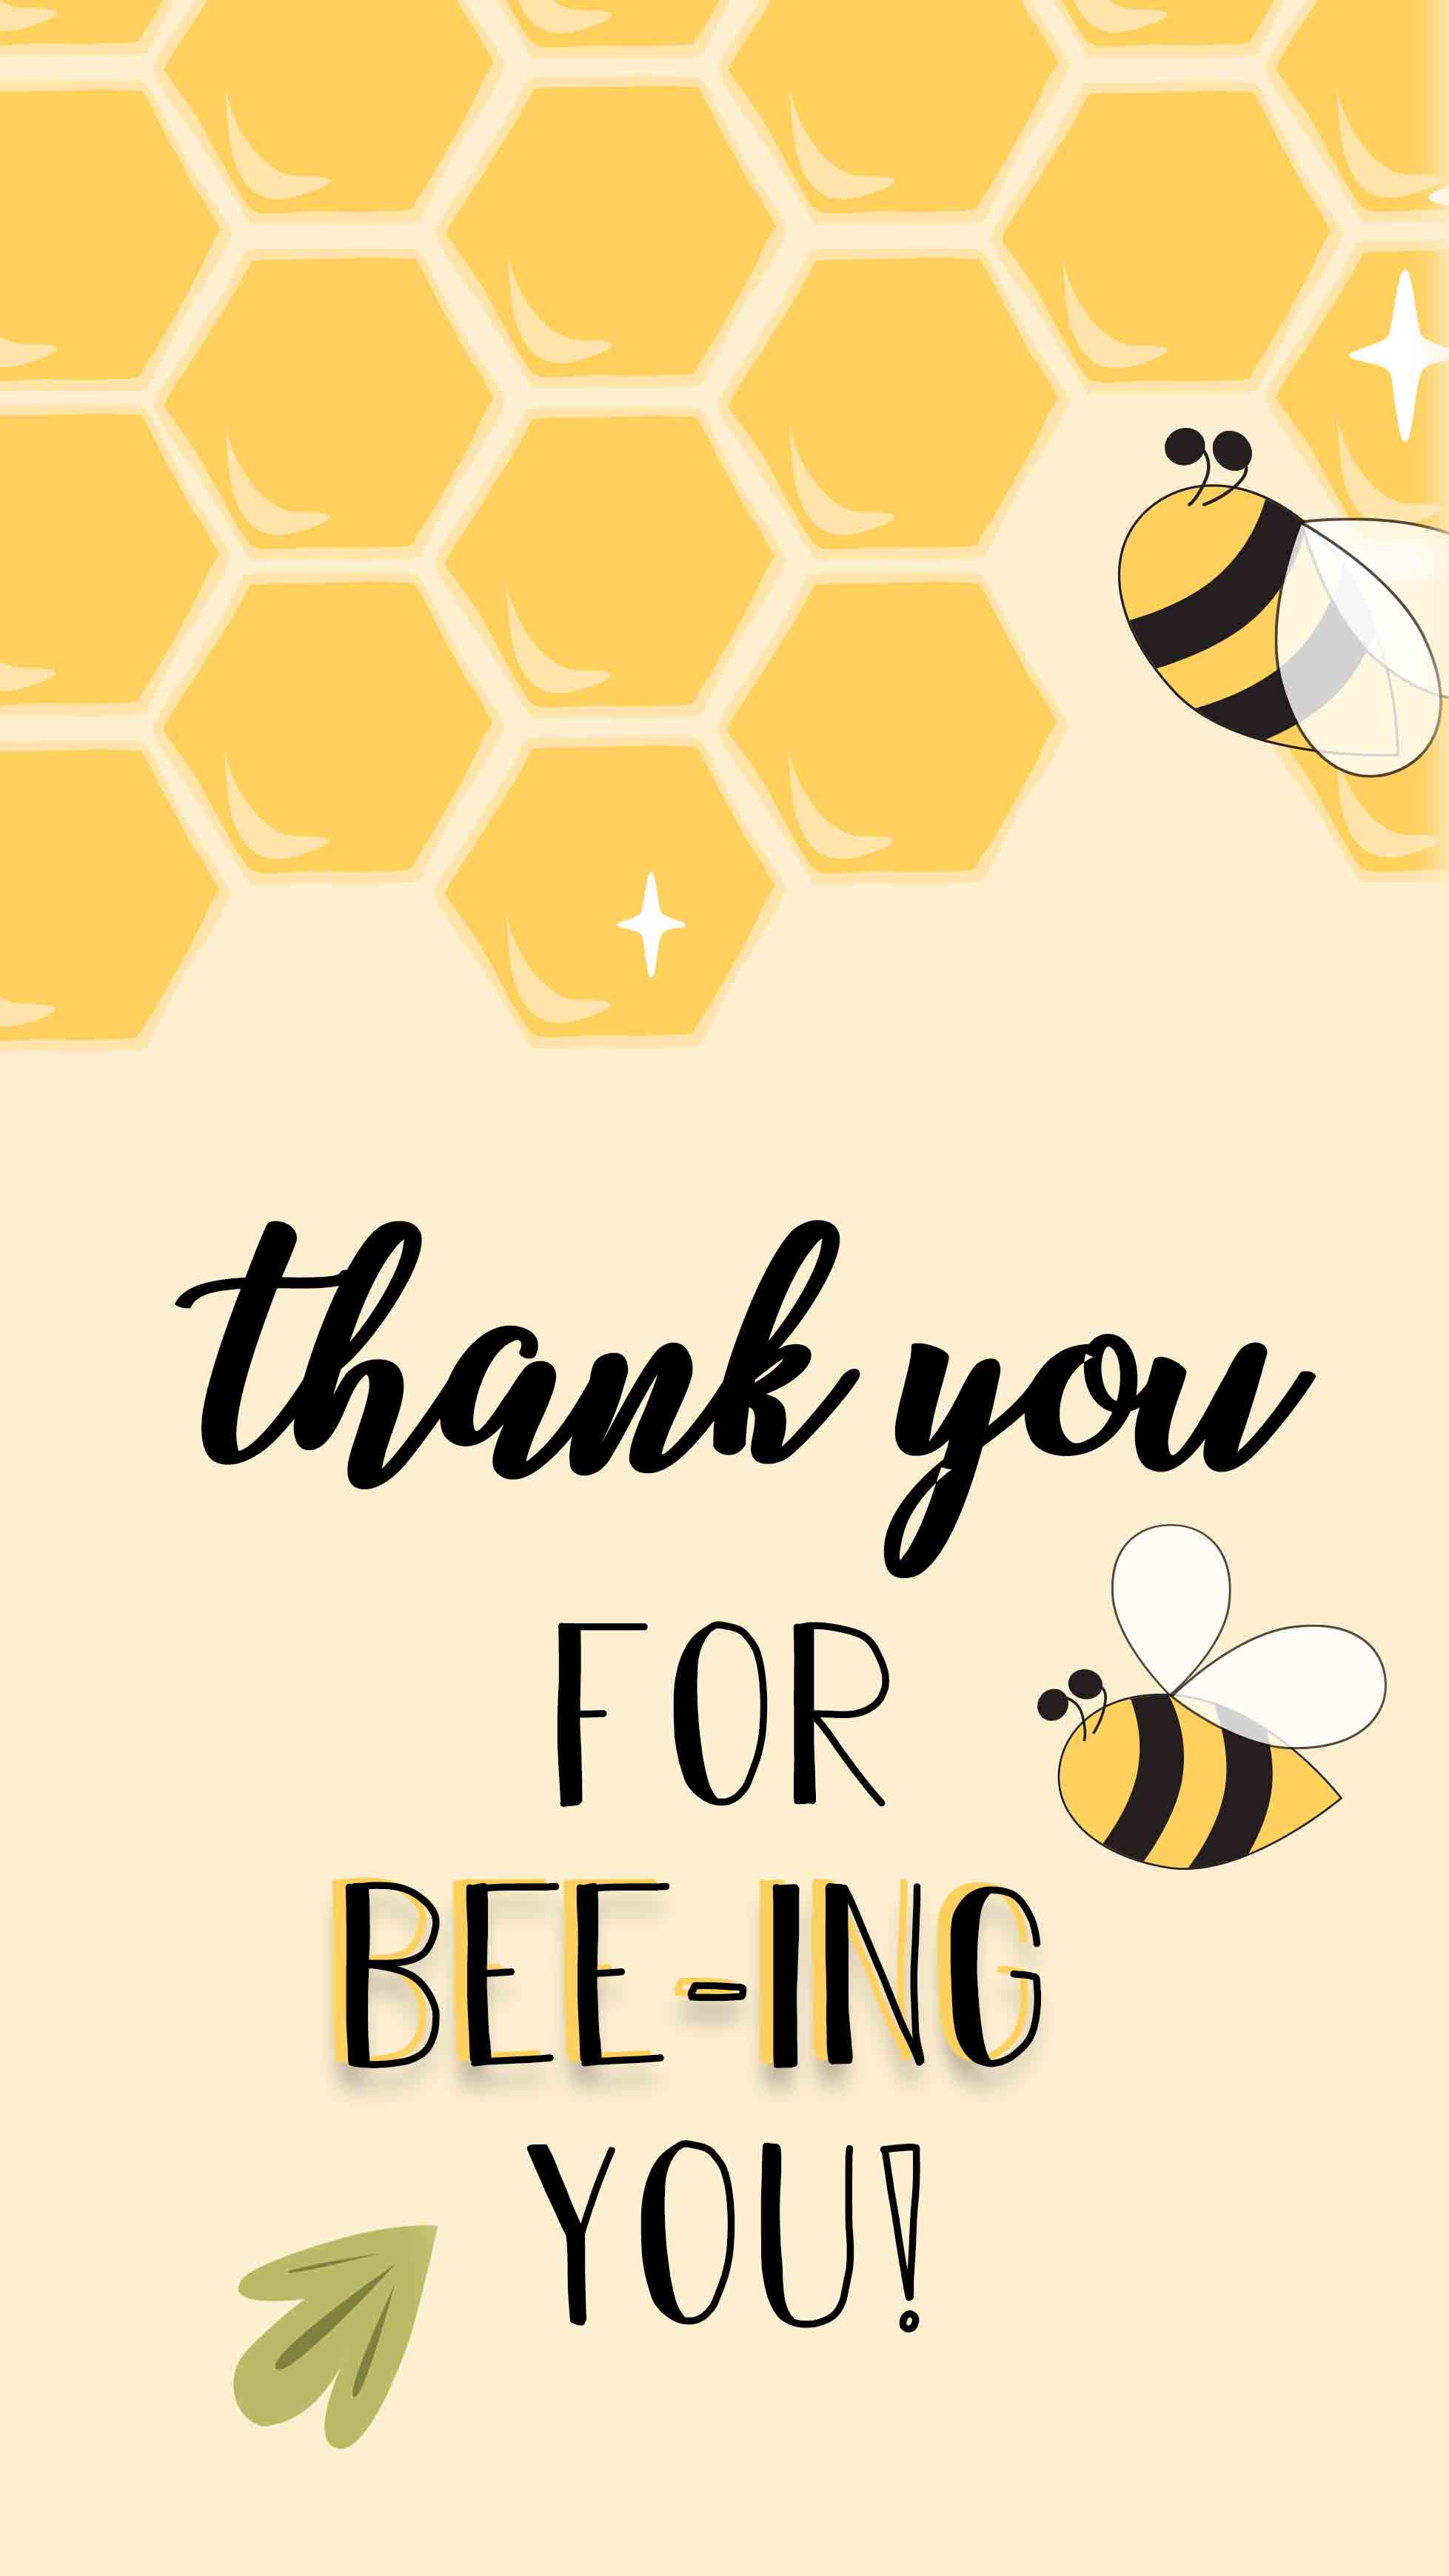 Bee-ing You